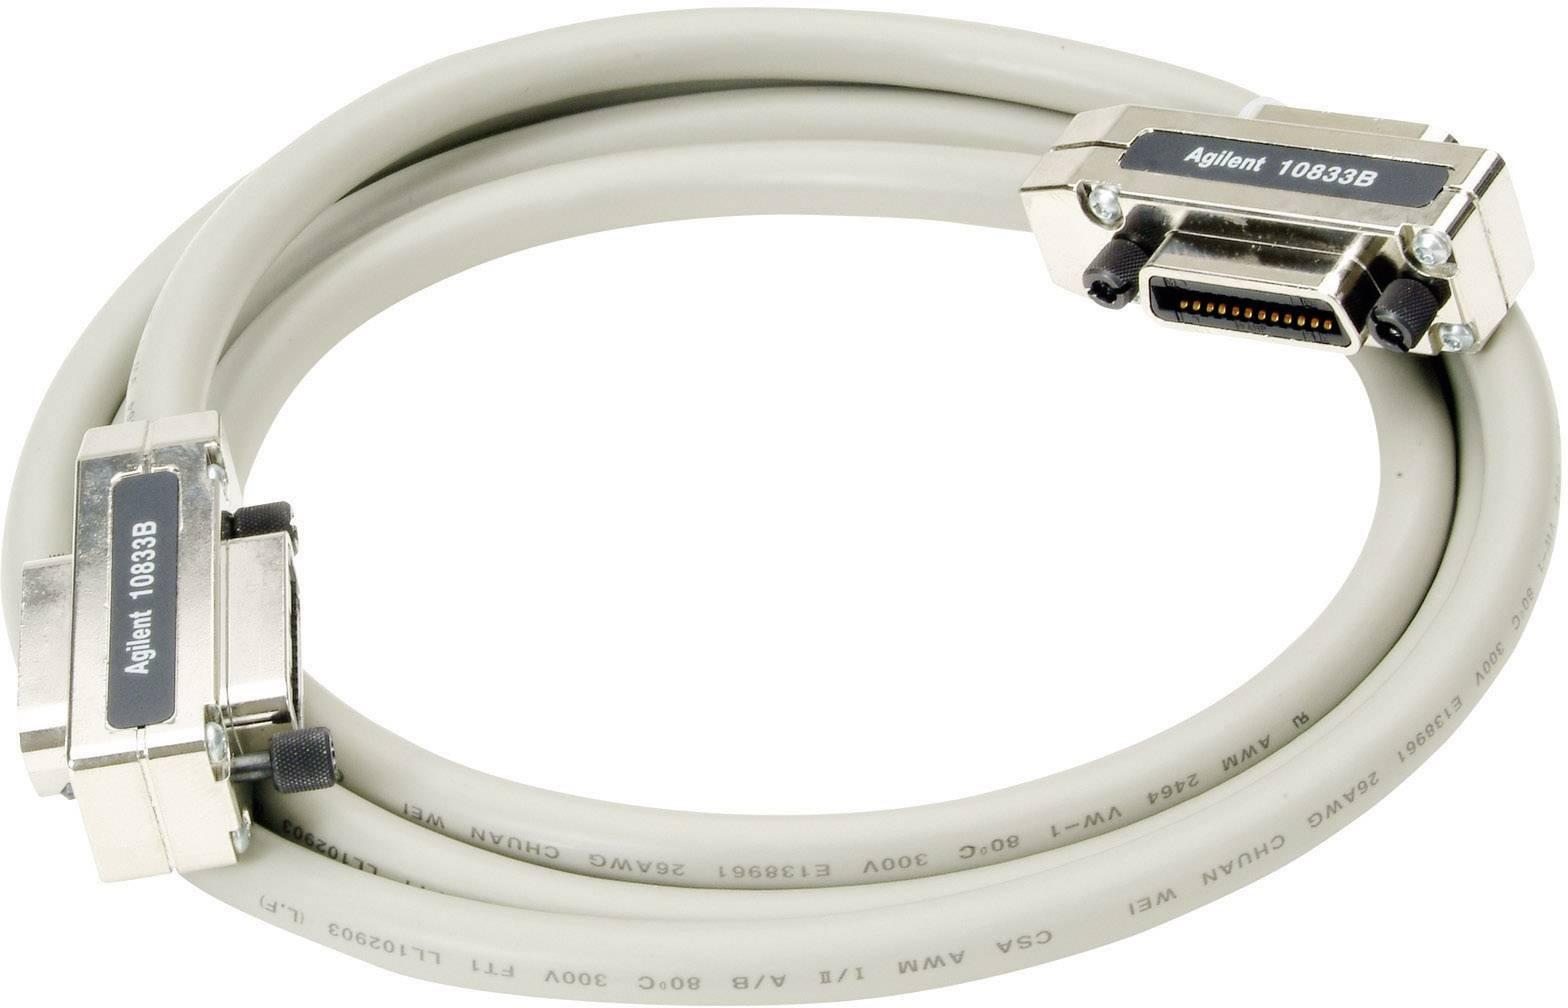 Keysight Technologies 10833D C